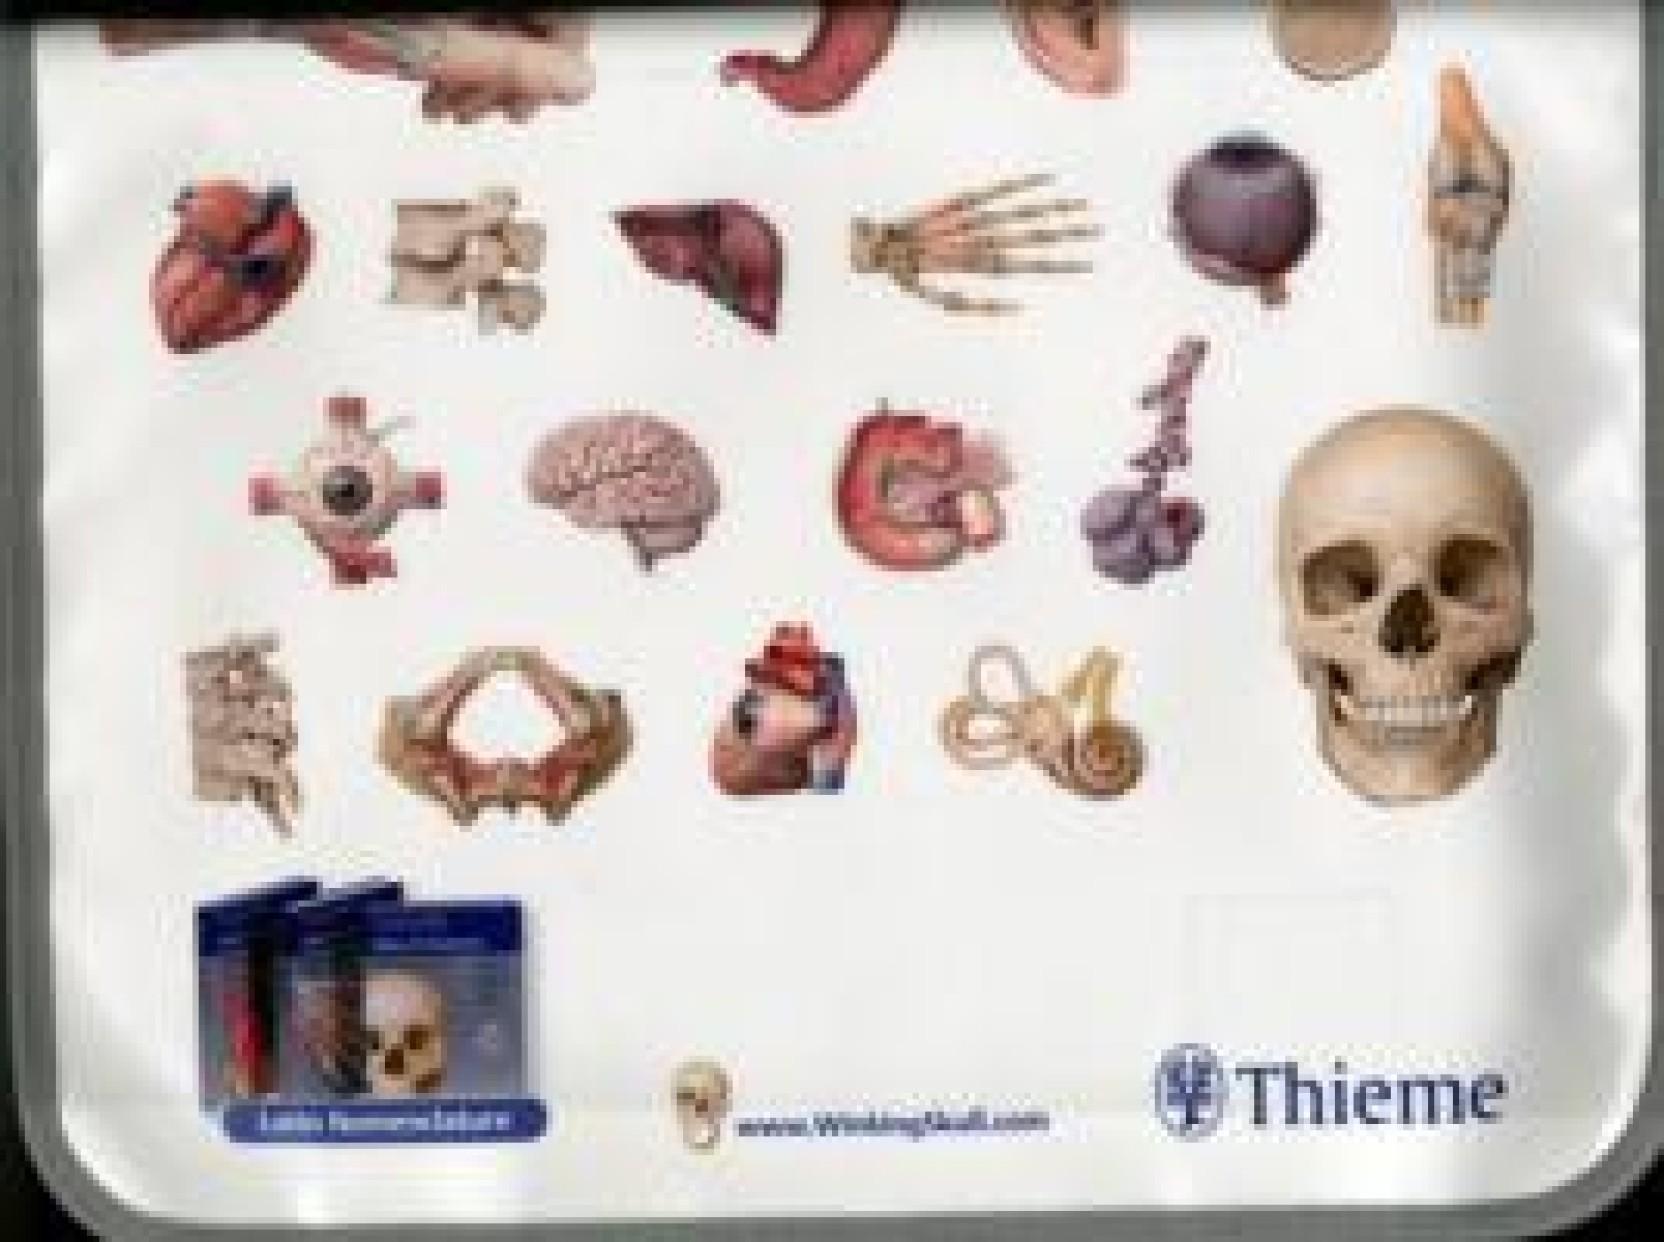 Thieme Atlas of Anatomy 3 Volume Set, Latin Nomenclature - Buy ...